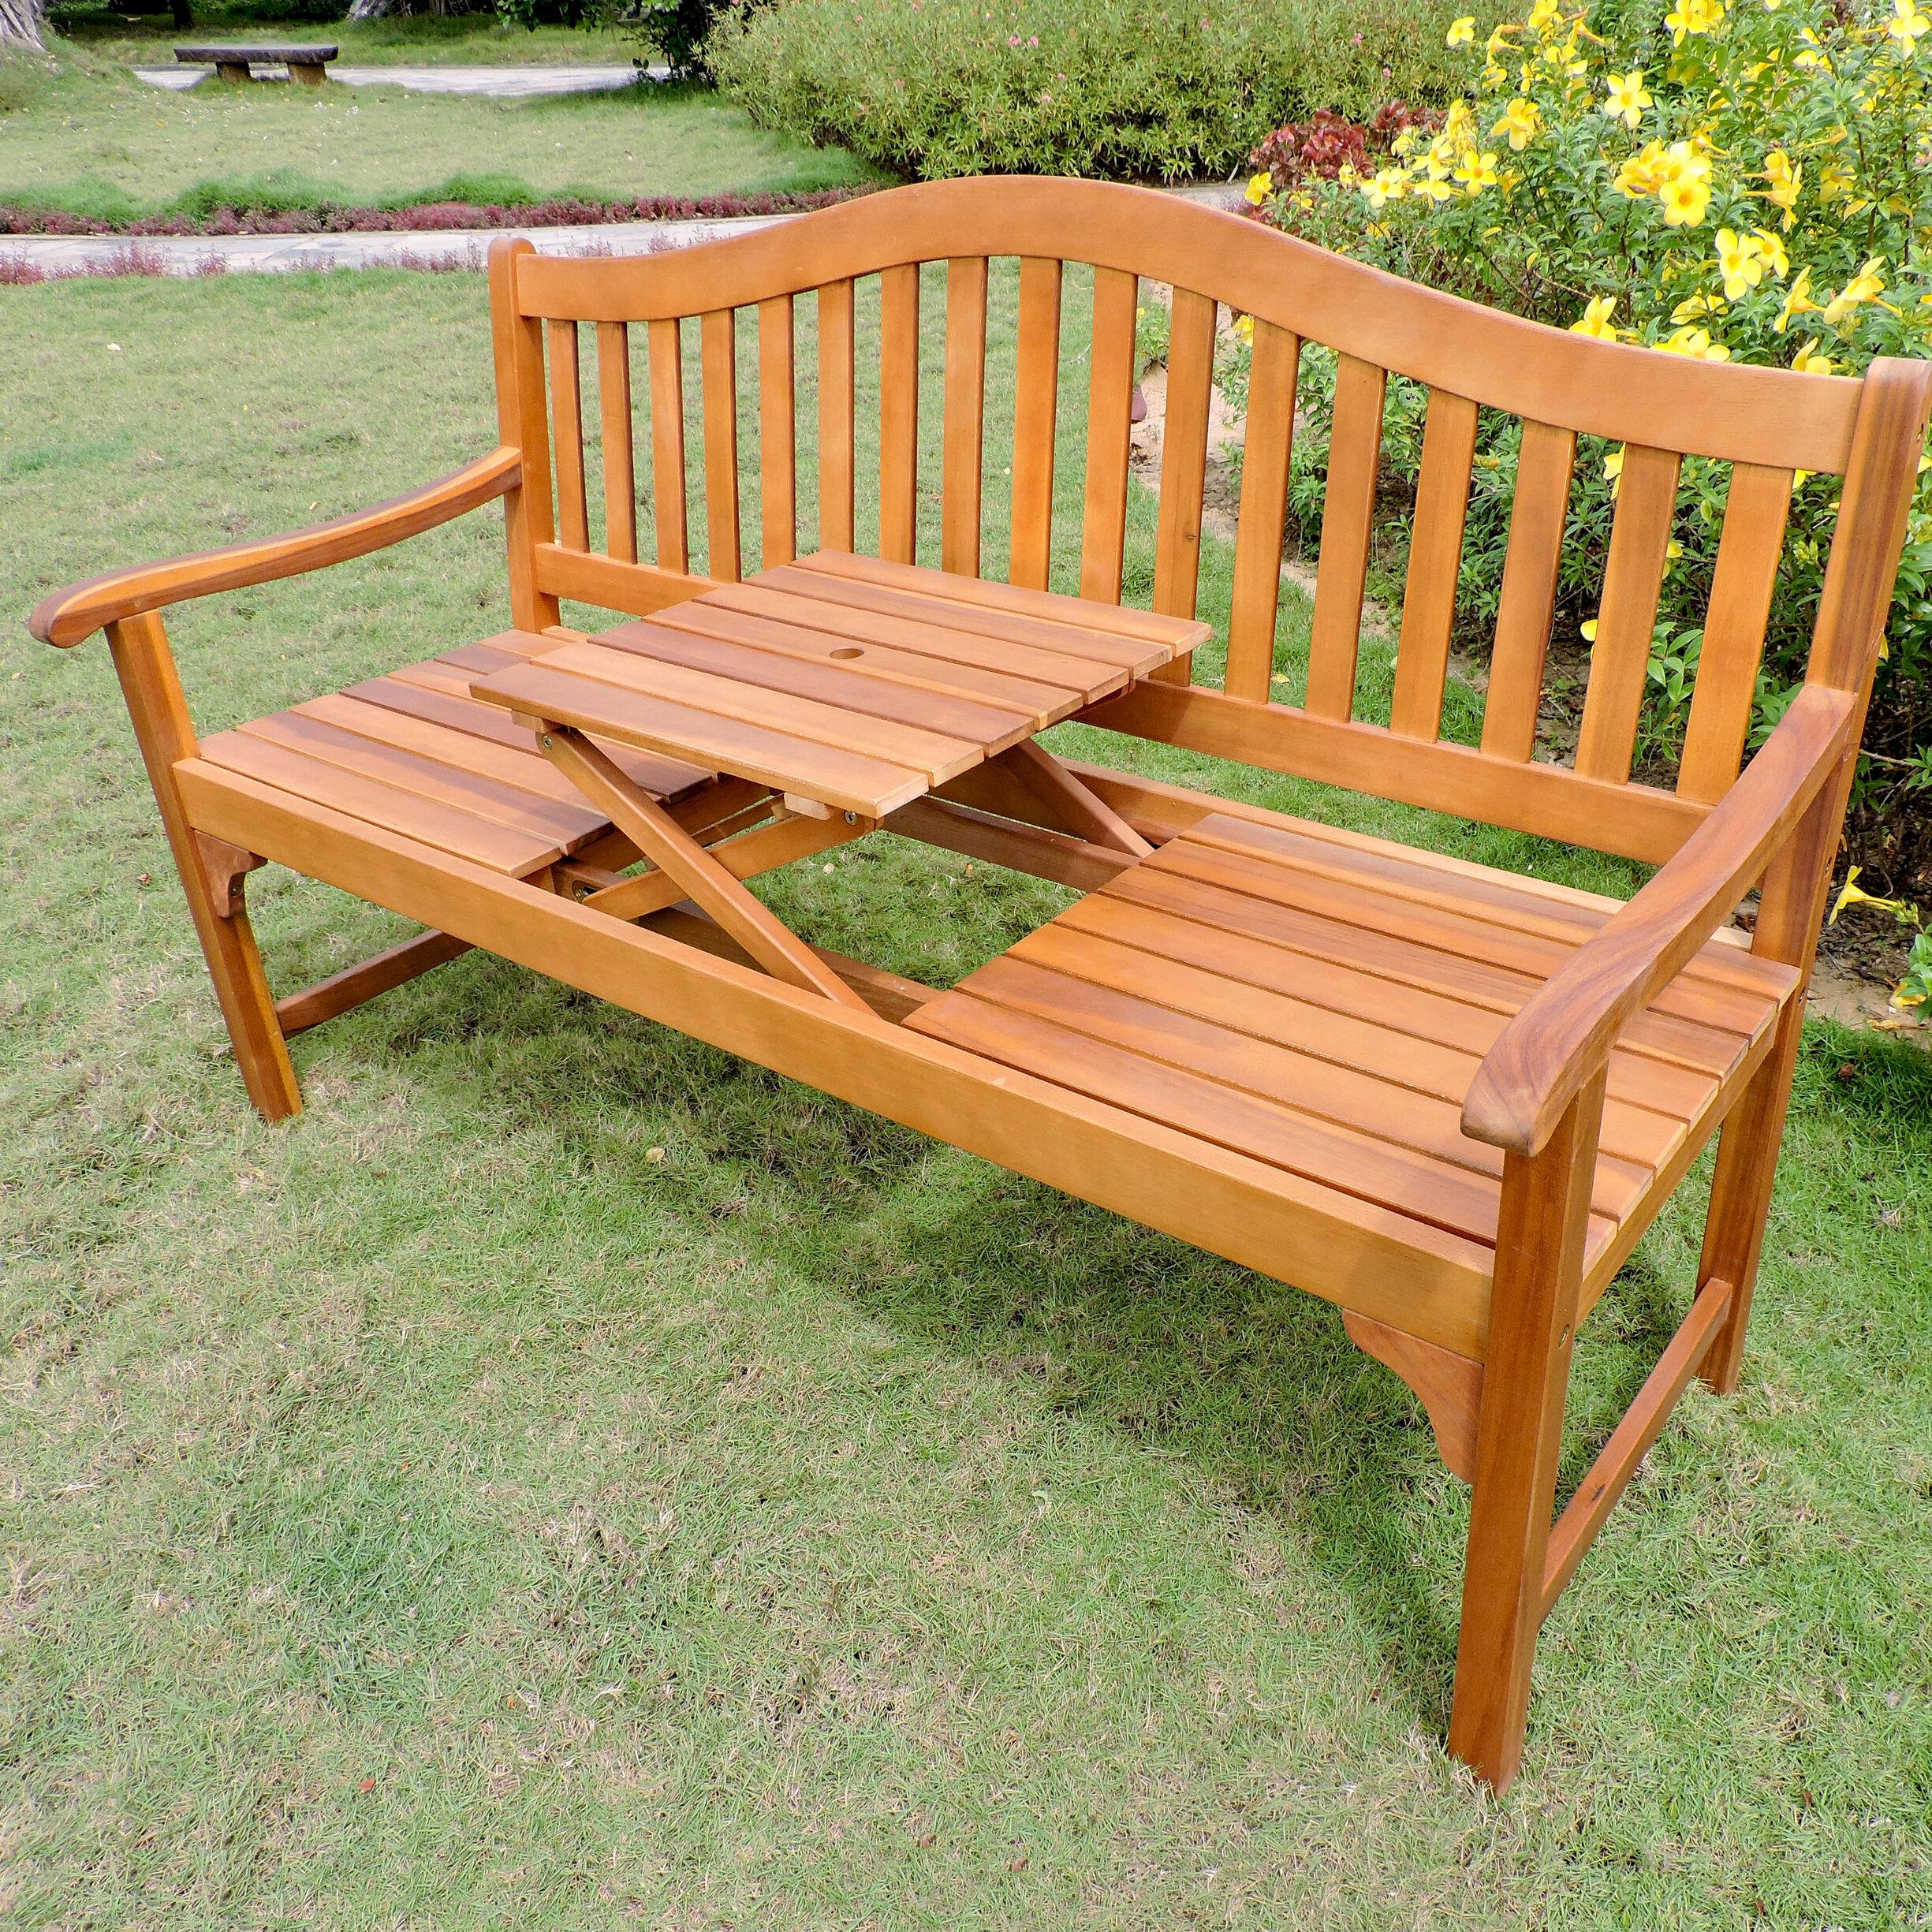 Leone Wooden Garden Bench With Leora Wooden Garden Benches (View 8 of 25)